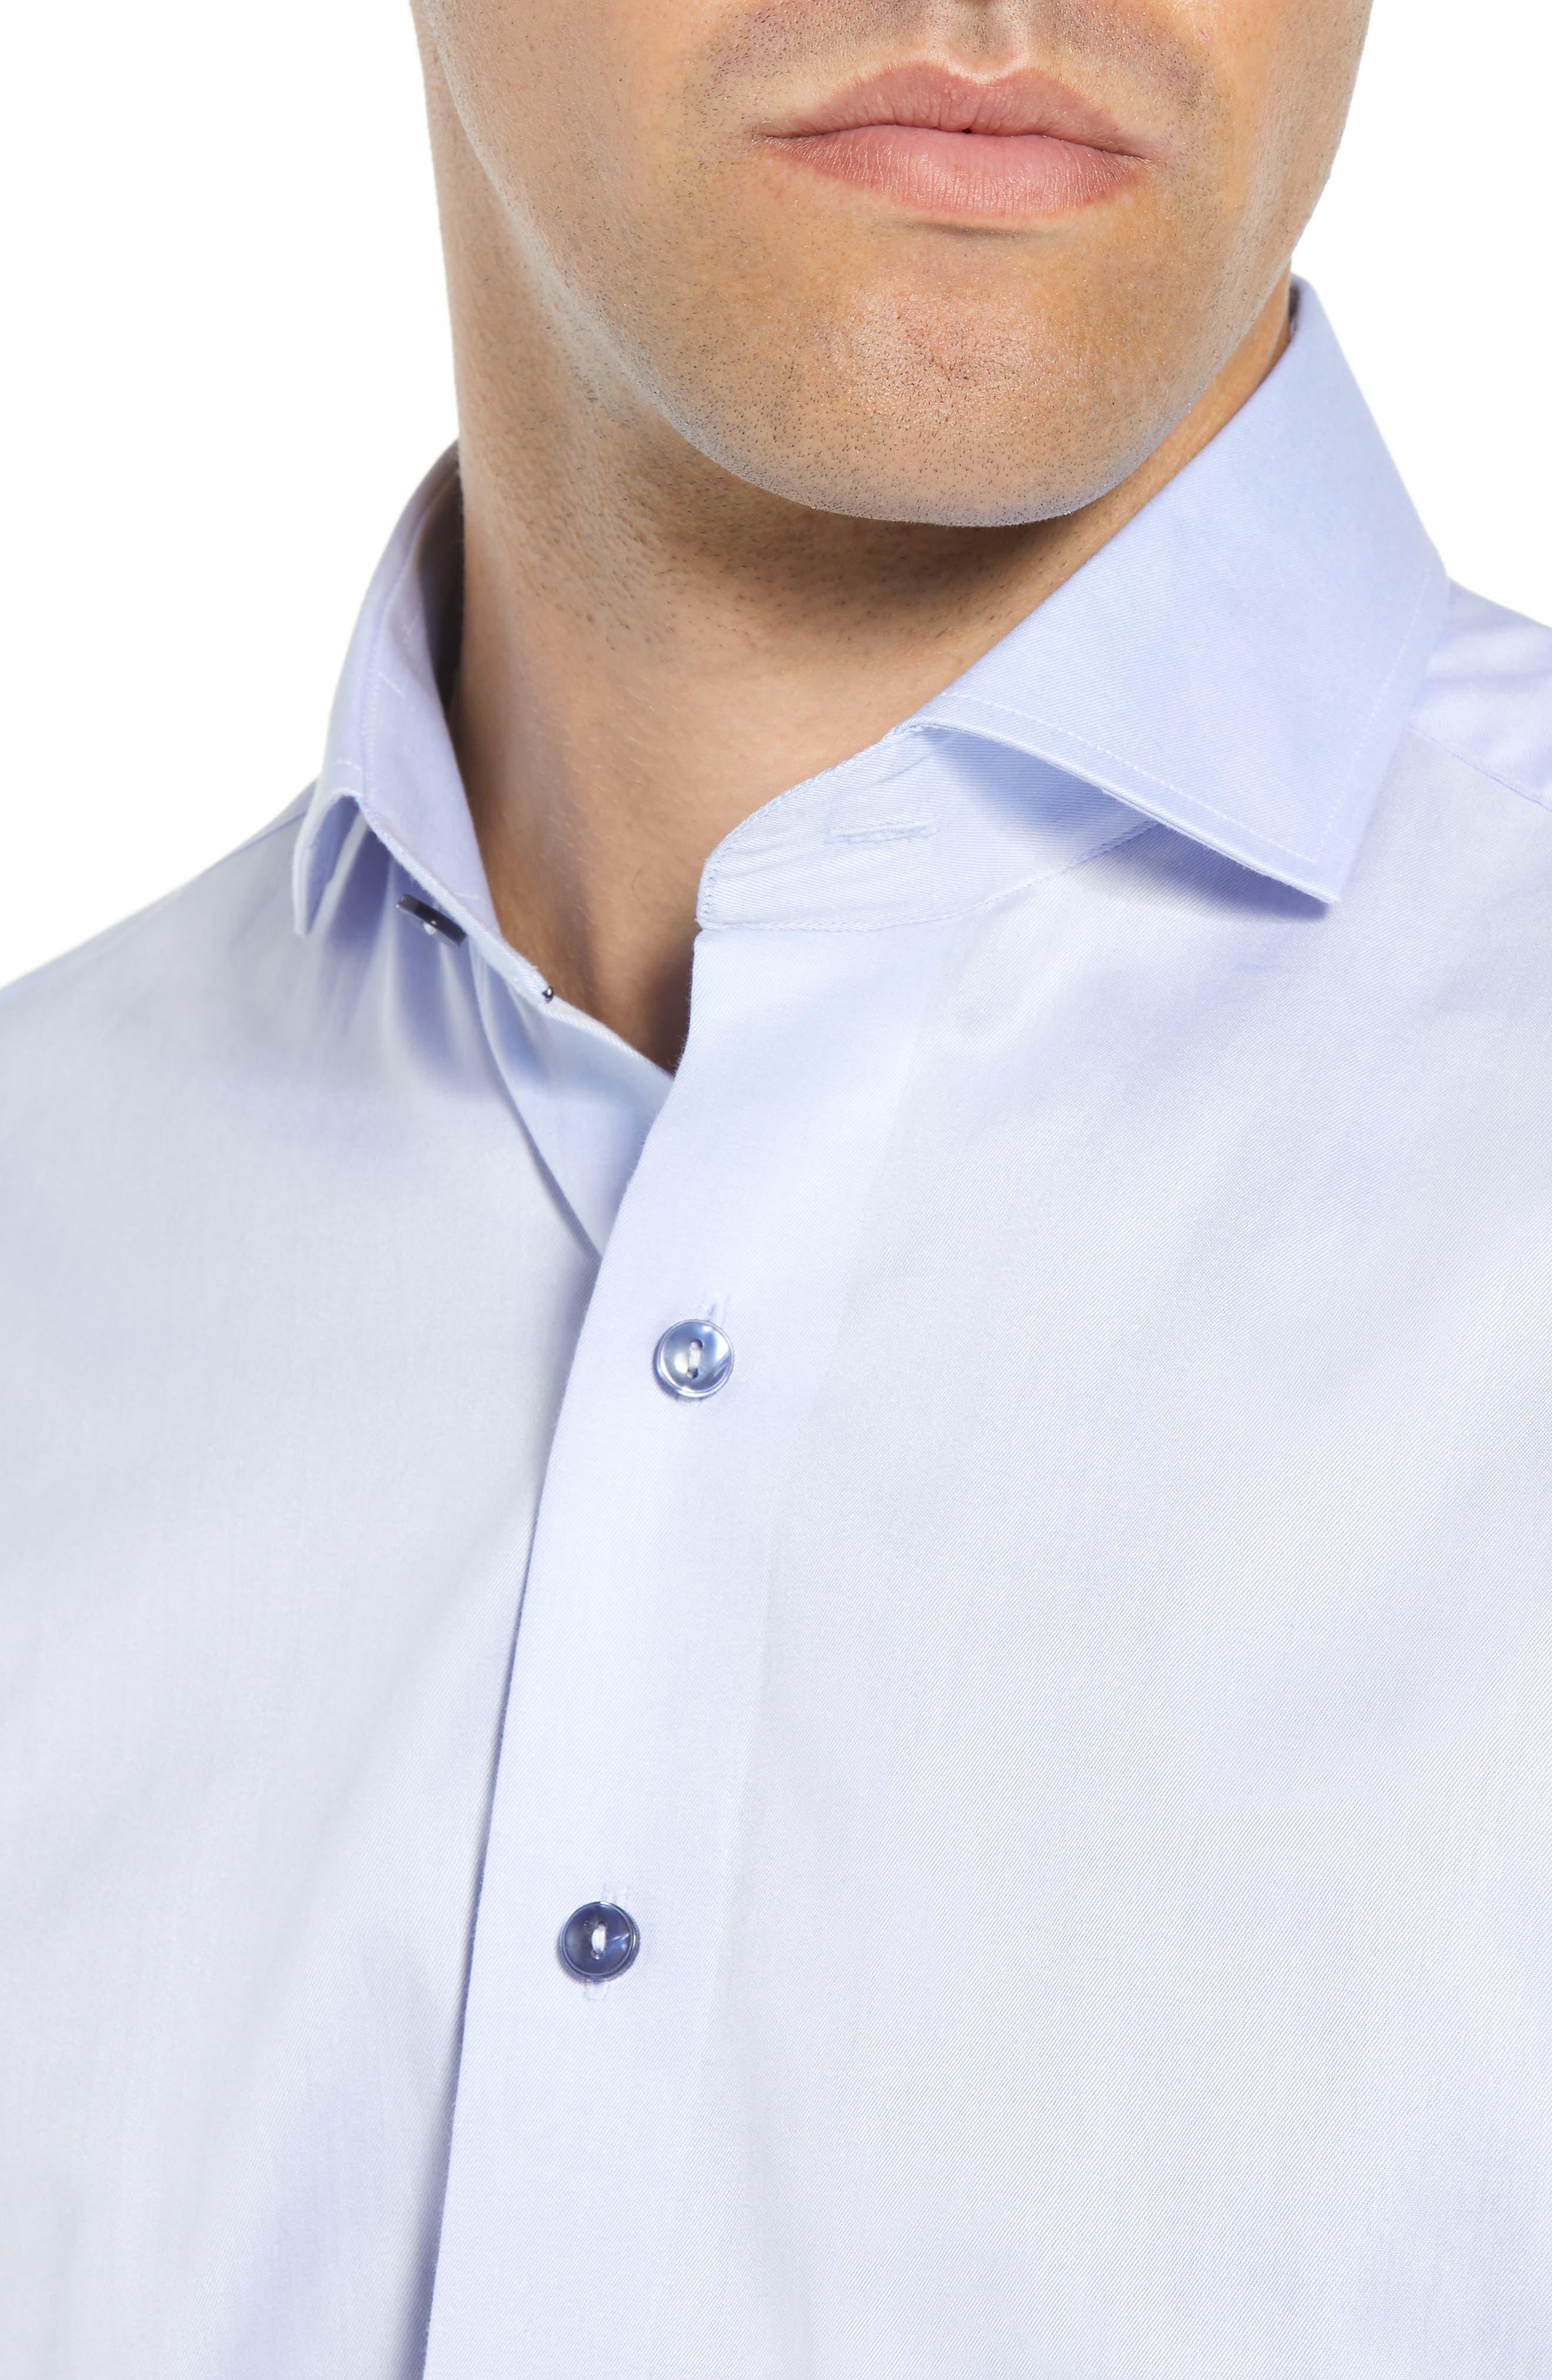 LORENZO UOMO,                             Trim Fit Solid Dress Shirt,                             Alternate thumbnail 2, color,                             LIGHT BLUE